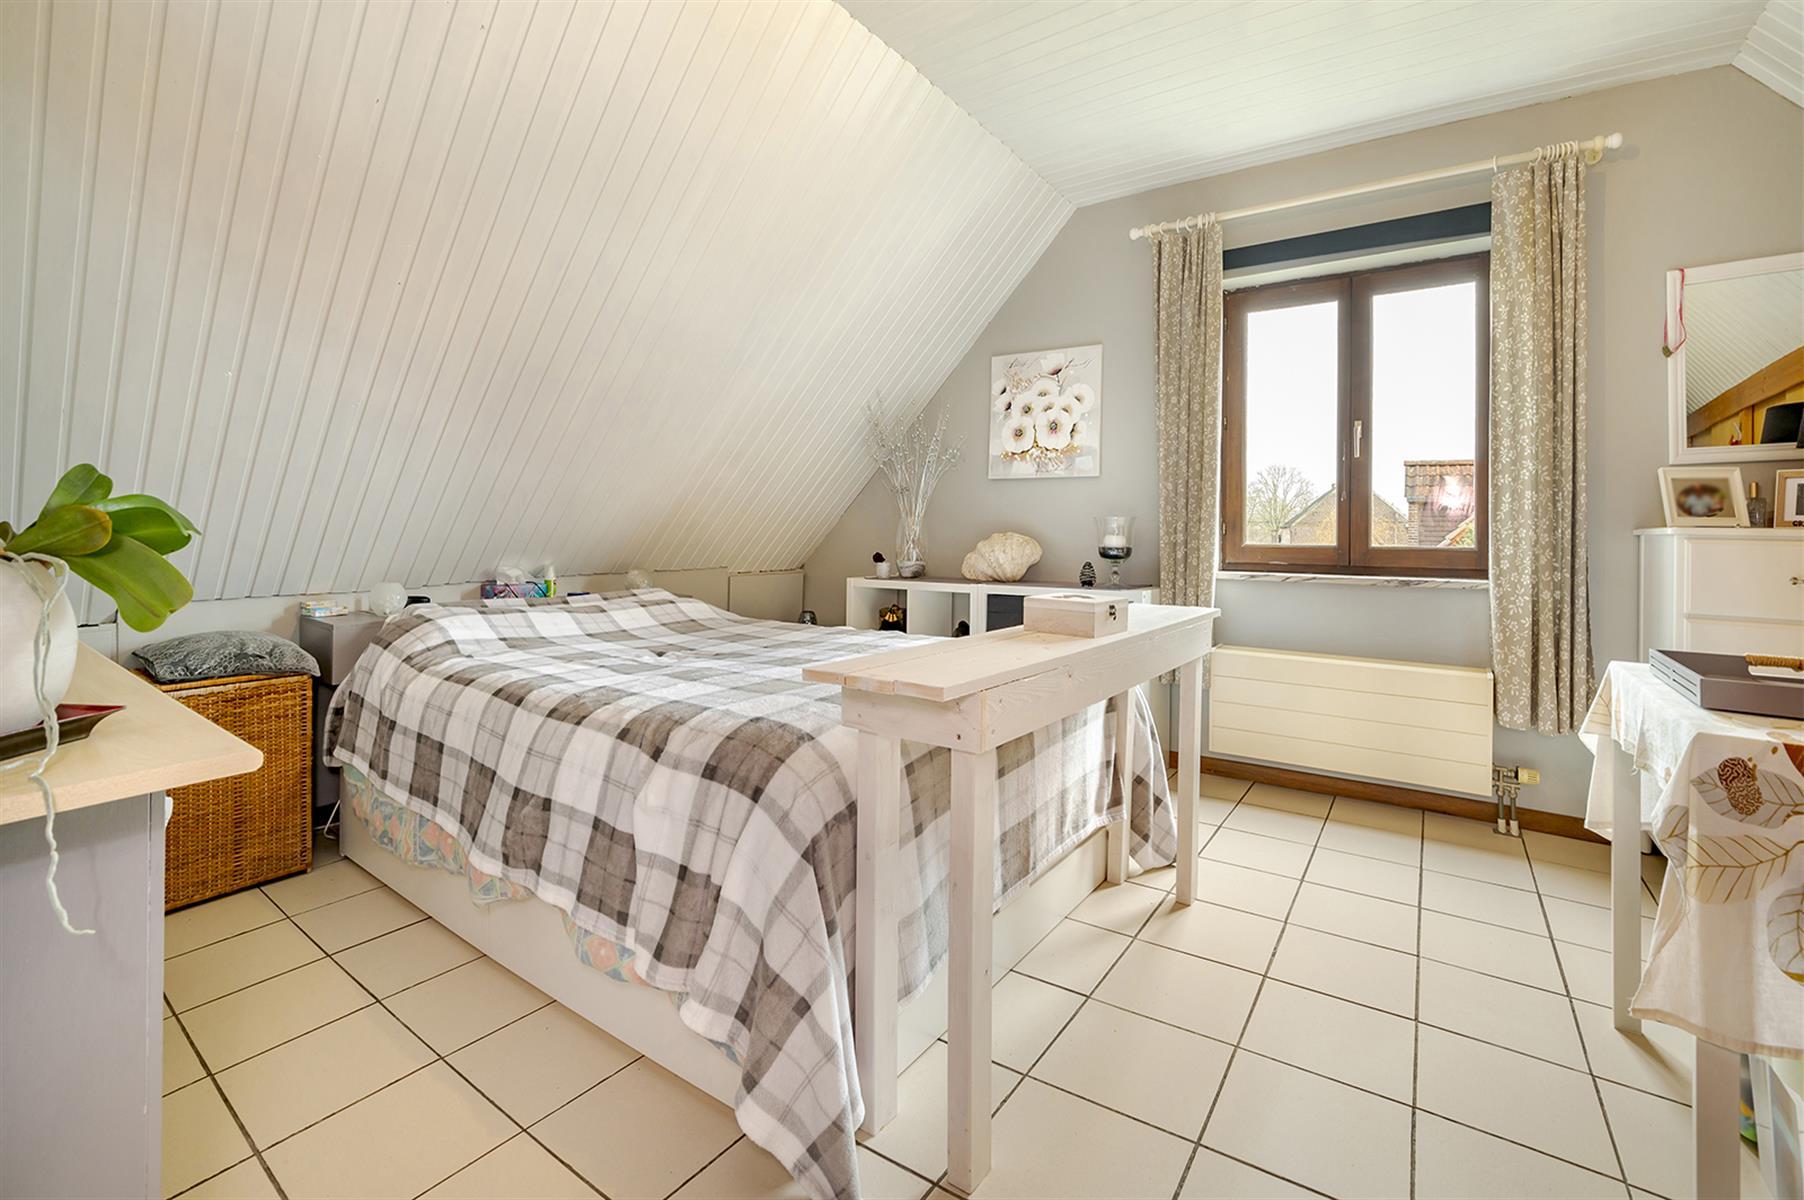 Maison - Jodoigne - #4085972-27